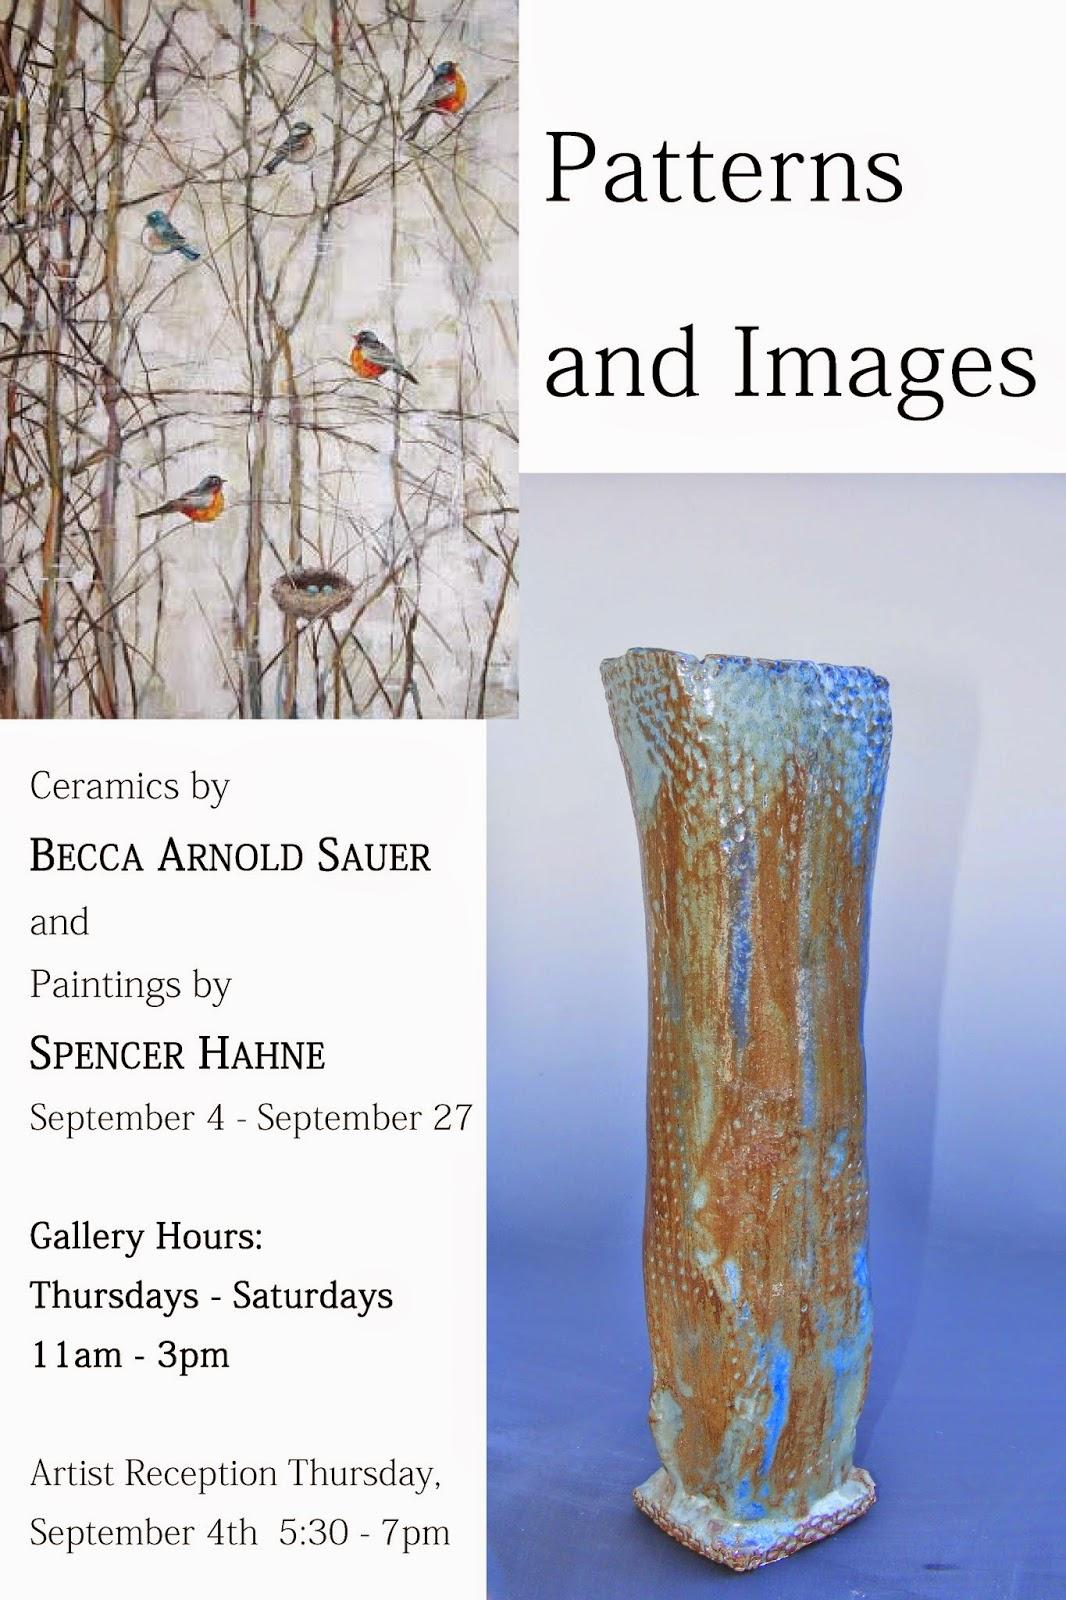 Artist Reception Thursday, September 4th 5:30 - 7pm - LYRIC CENTER FOR THE ARTS